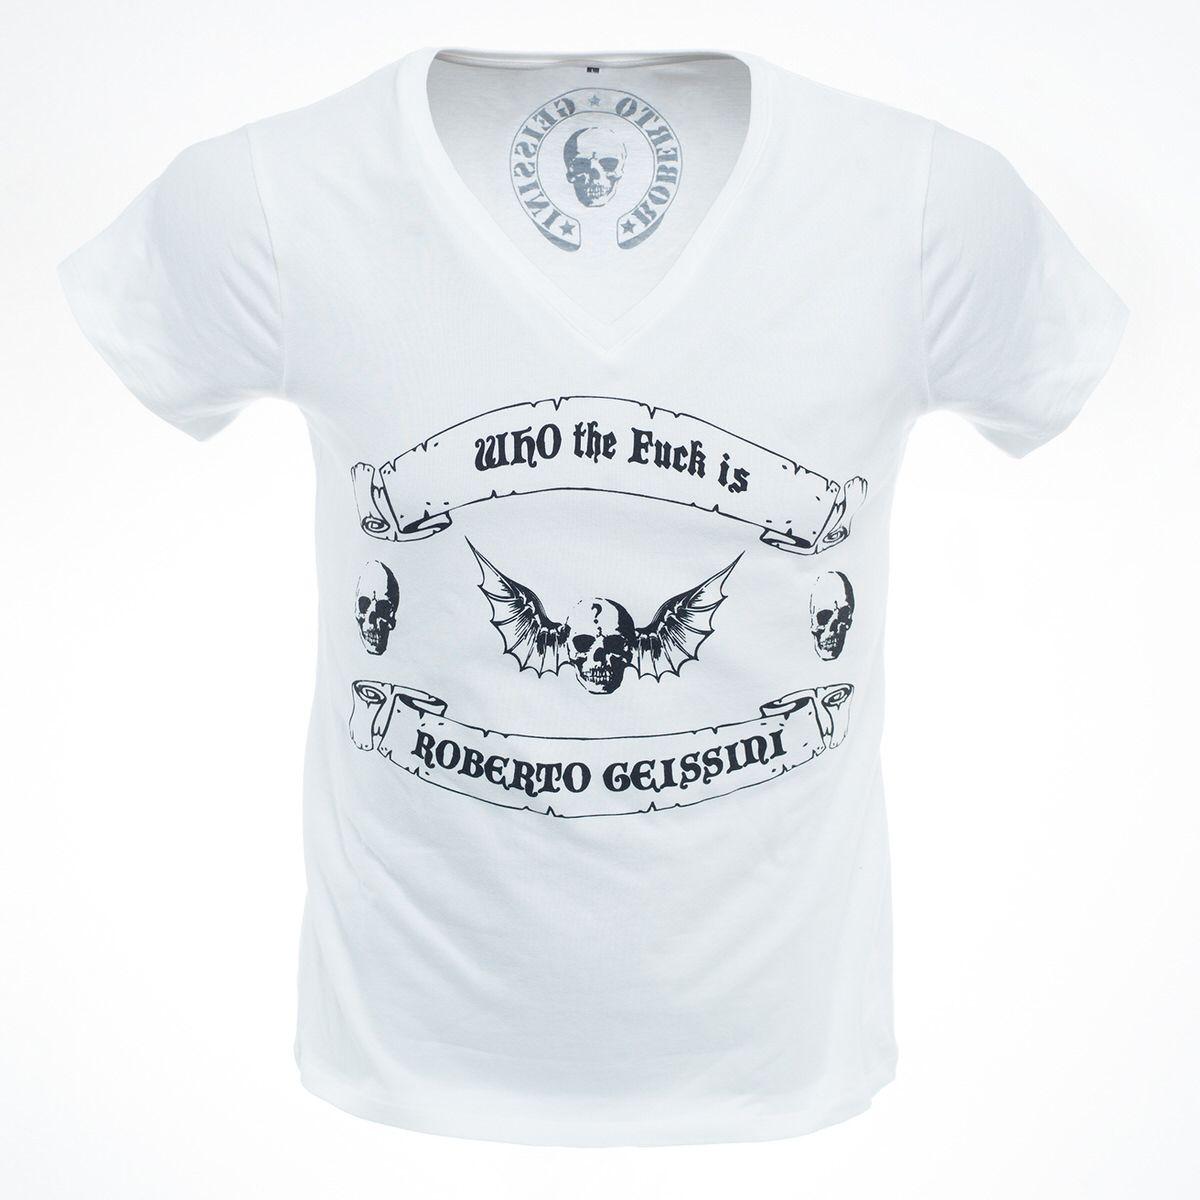 Pin Von Roberto Geissini Auf Roberto Geissini Damen Shirts In 2020 Lederjacke Damen Hemd Mode